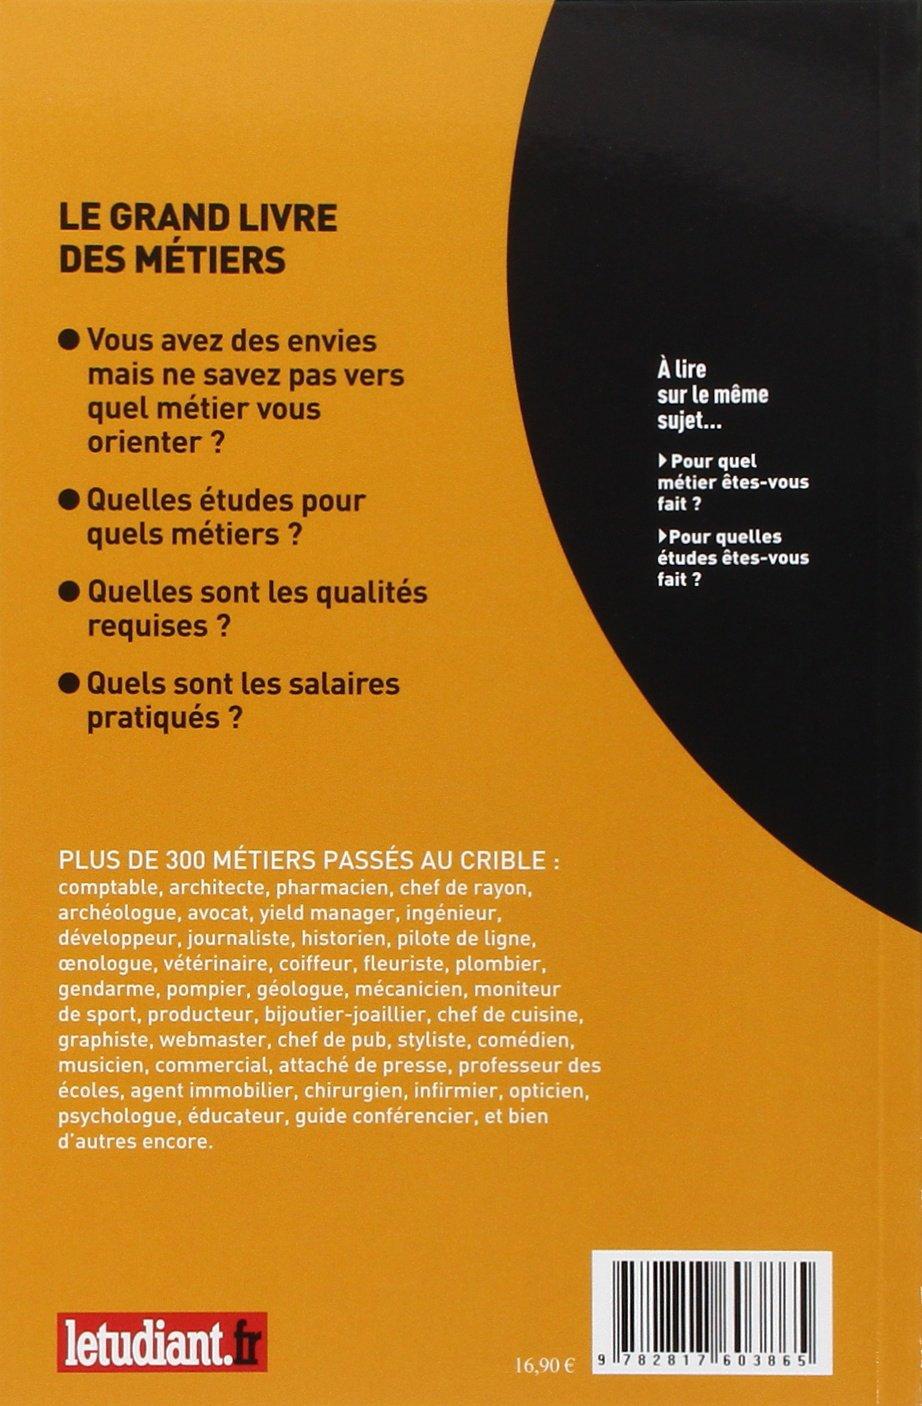 Le grand livre des métiers: Amazon.es: Céline Authemayou: Libros en idiomas extranjeros